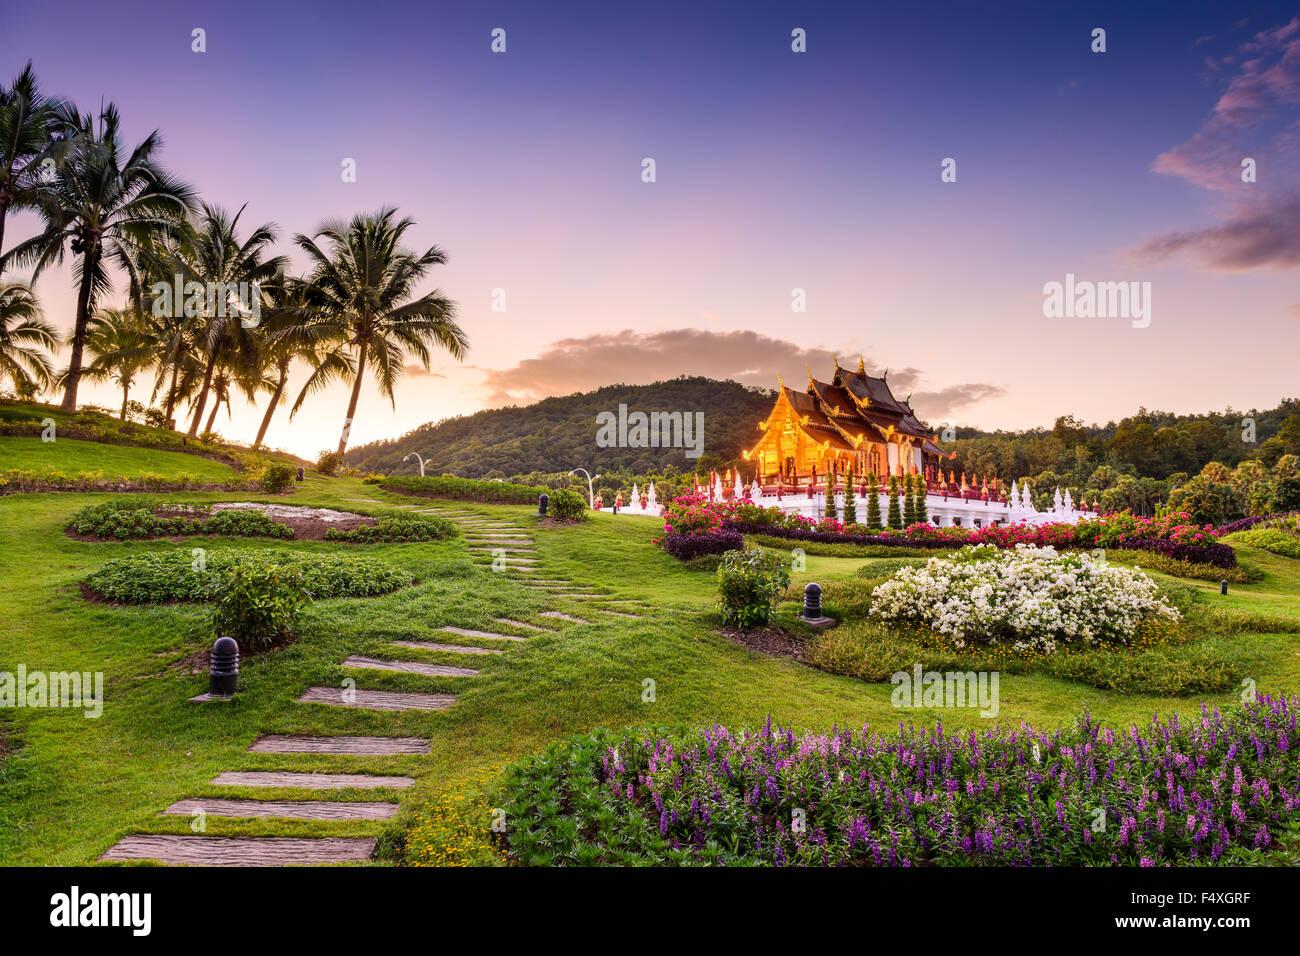 Chiang Mai, Thaïlande au Royal Flora Ratchaphruek Park. Photo Stock